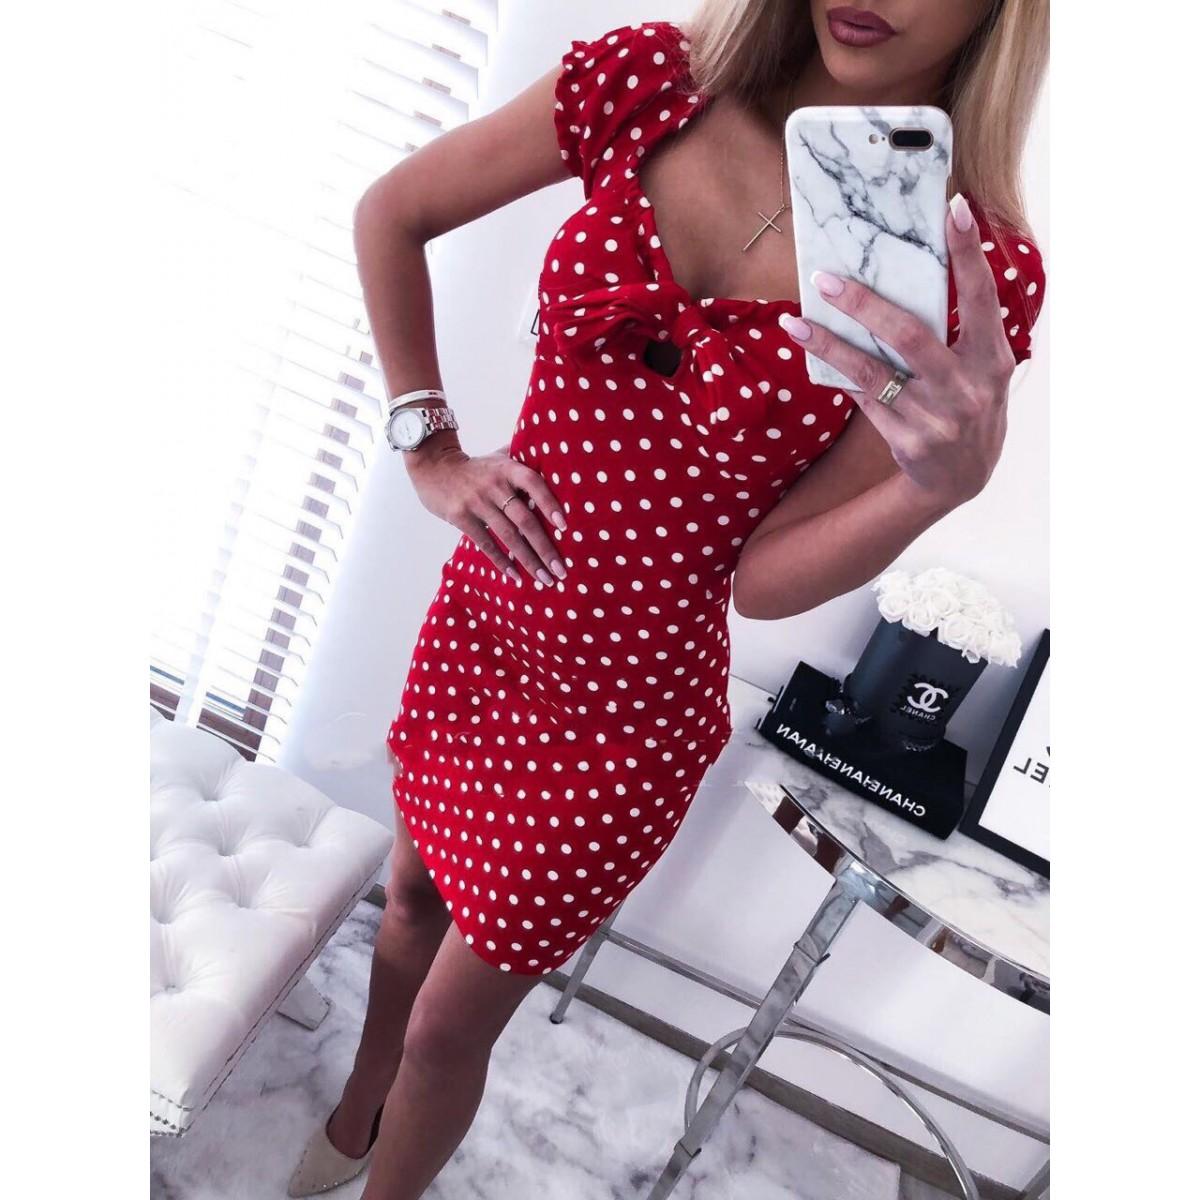 6990f9a4c39 Червена рокля на точки - Damski.bg